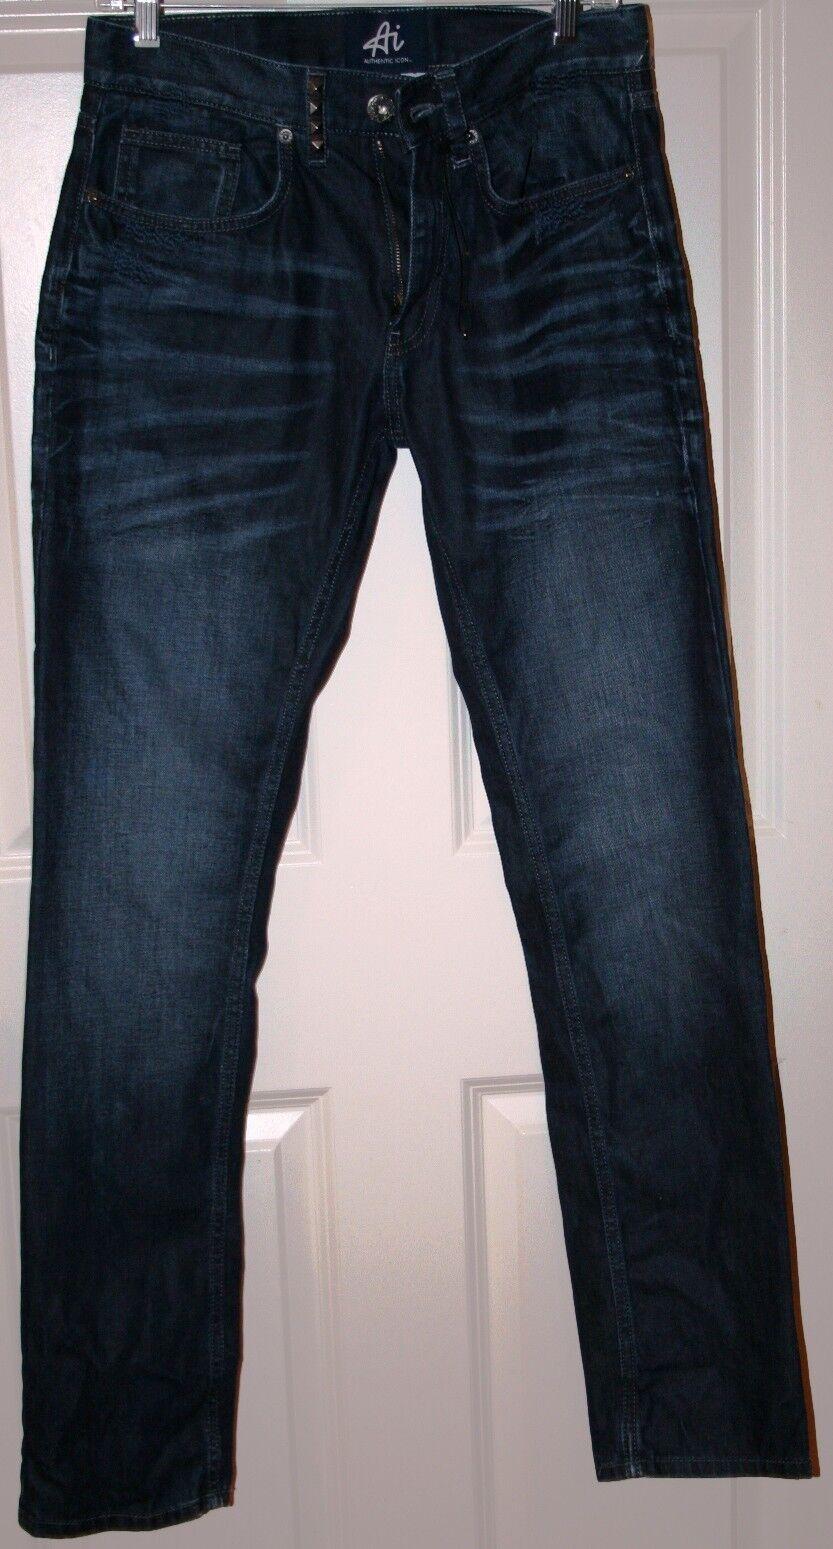 NWoT Authentic Icon Men's Slim Straight Jeans in Dark Resin Wash 30 32